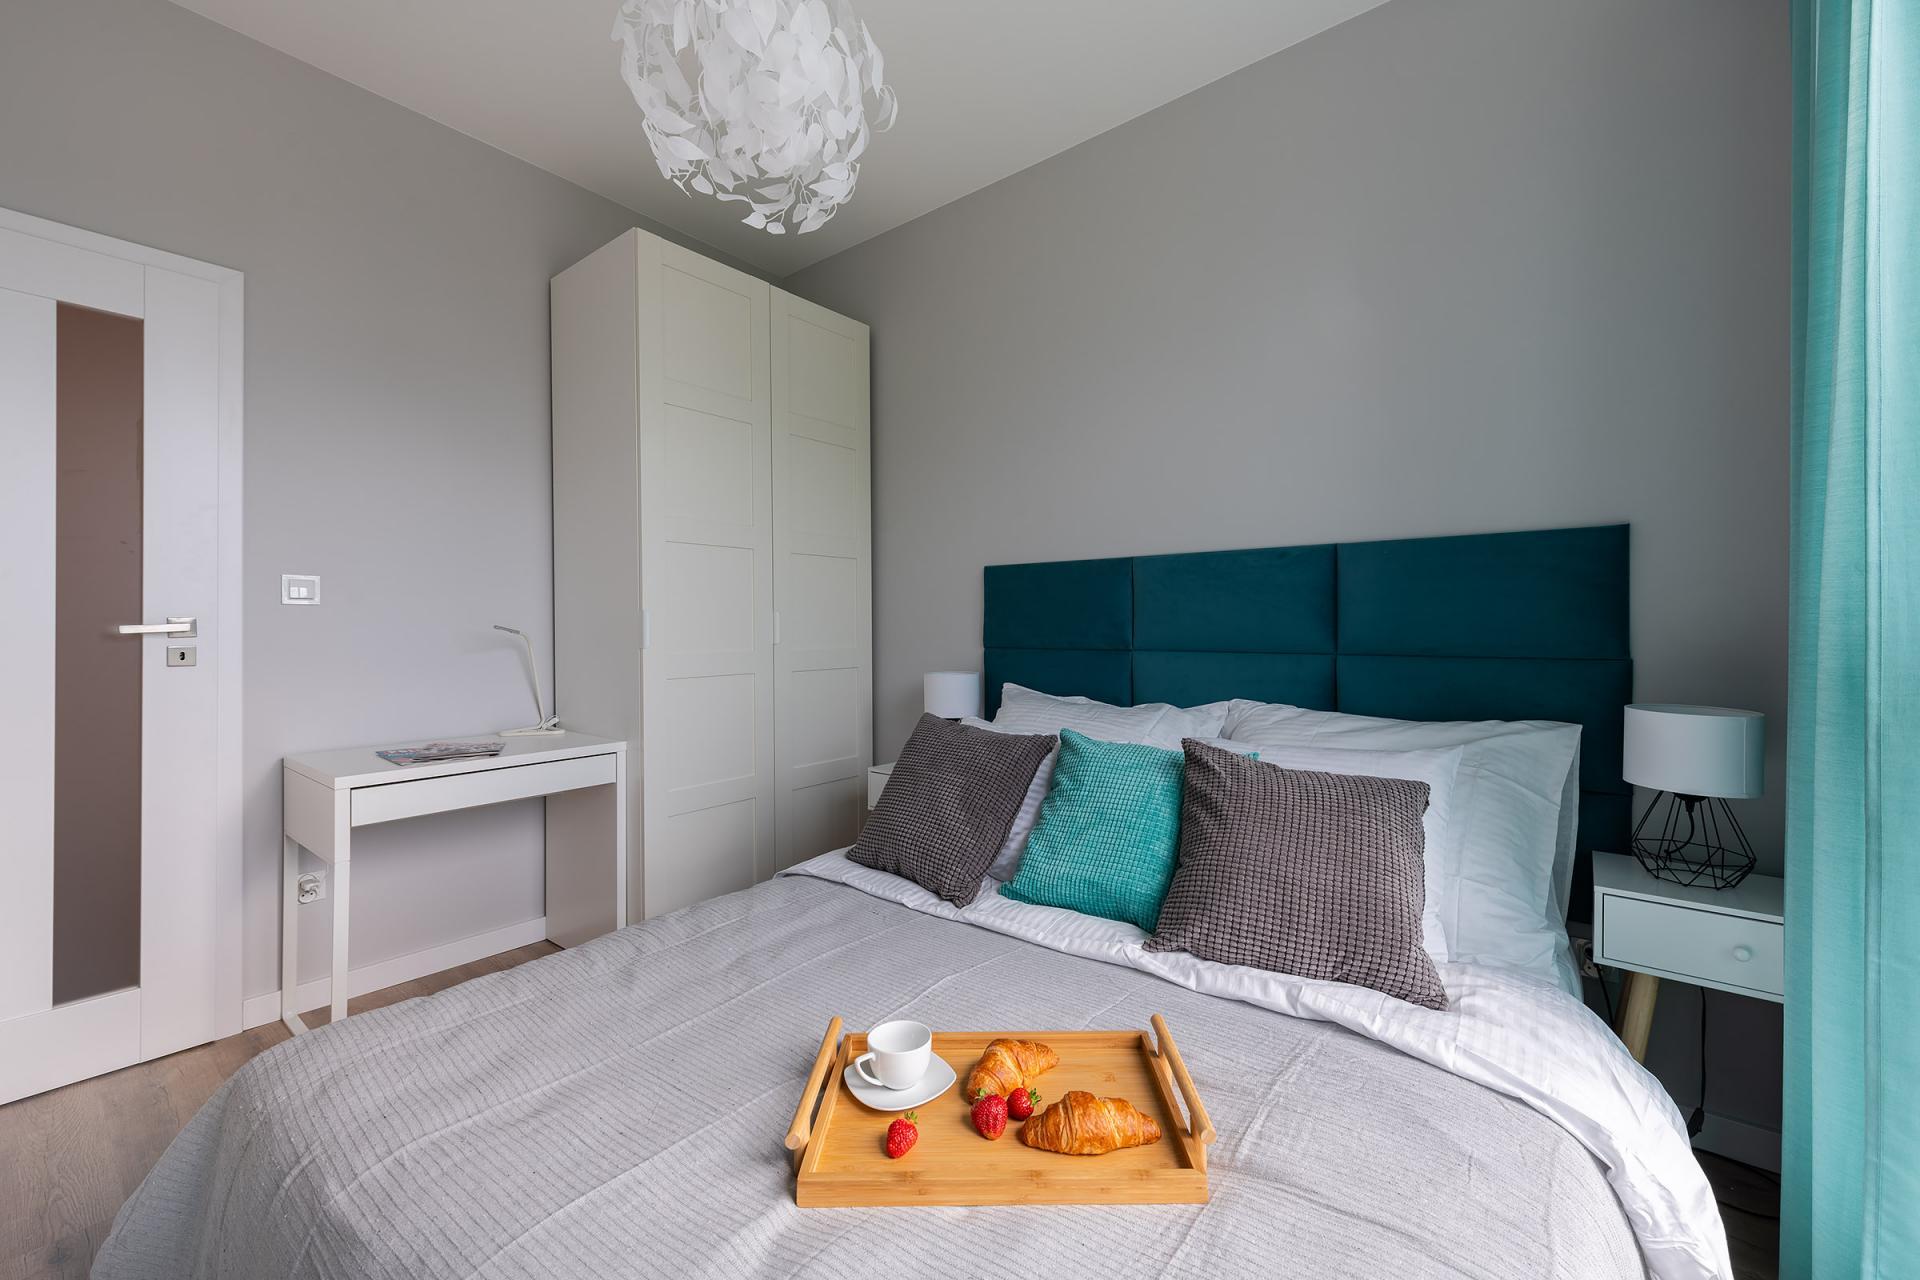 Comfortable bed at Cybernetyki Apartments, Sluzewiec, Warsaw